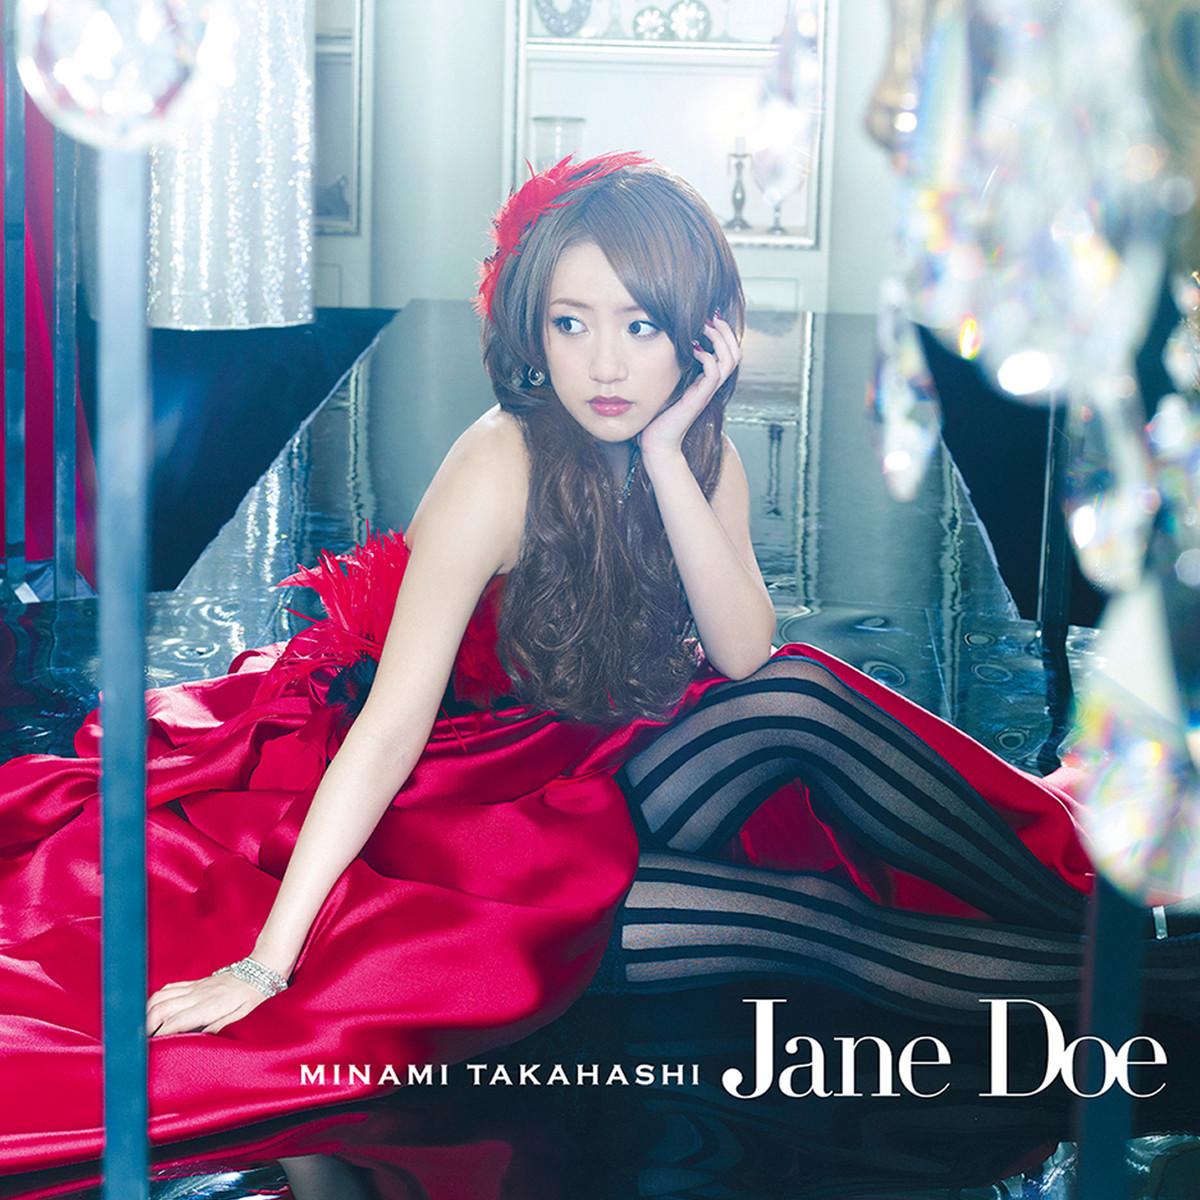 20170205.01.06 Minami Takahashi - Jane Doe (Type A) cover 2.jpg